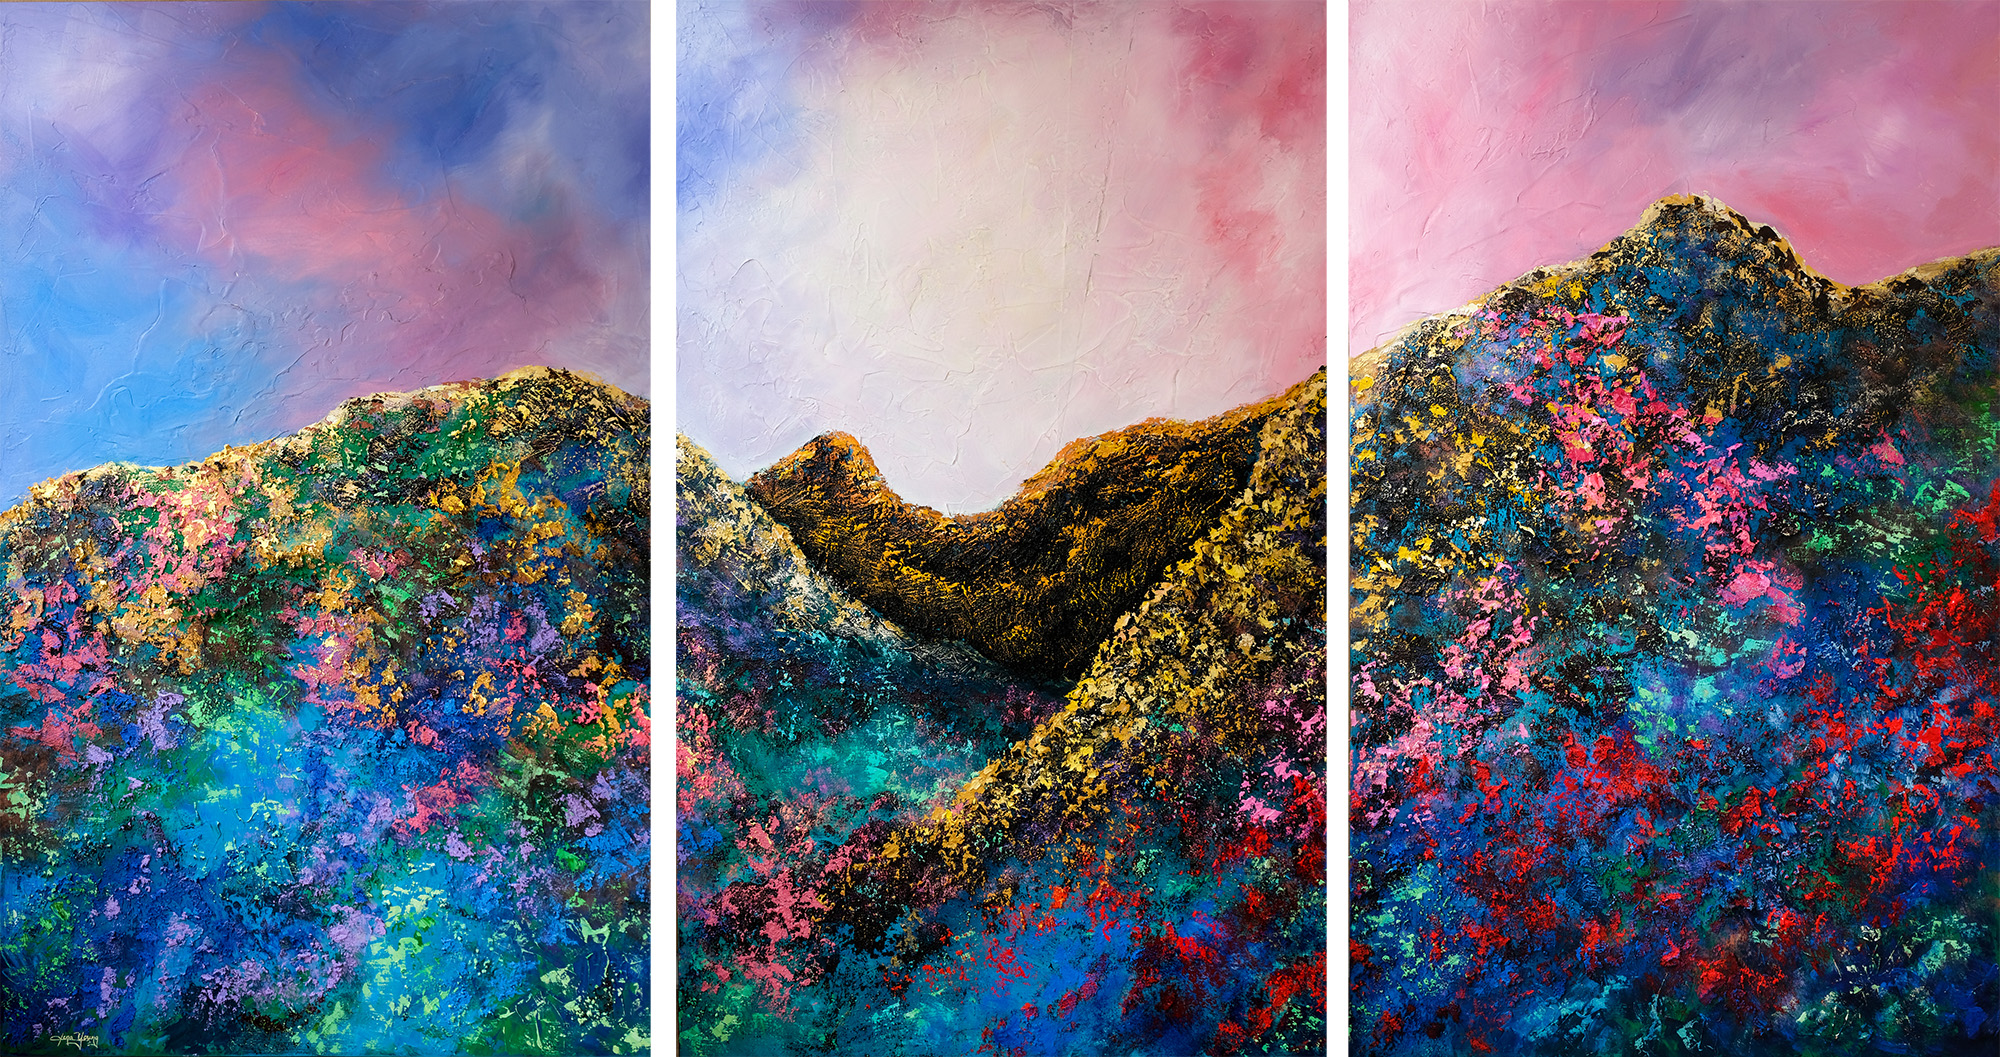 《光耀》2019 Oil, acrylic, glass beads, sand on canvas, triptych  122x229cm